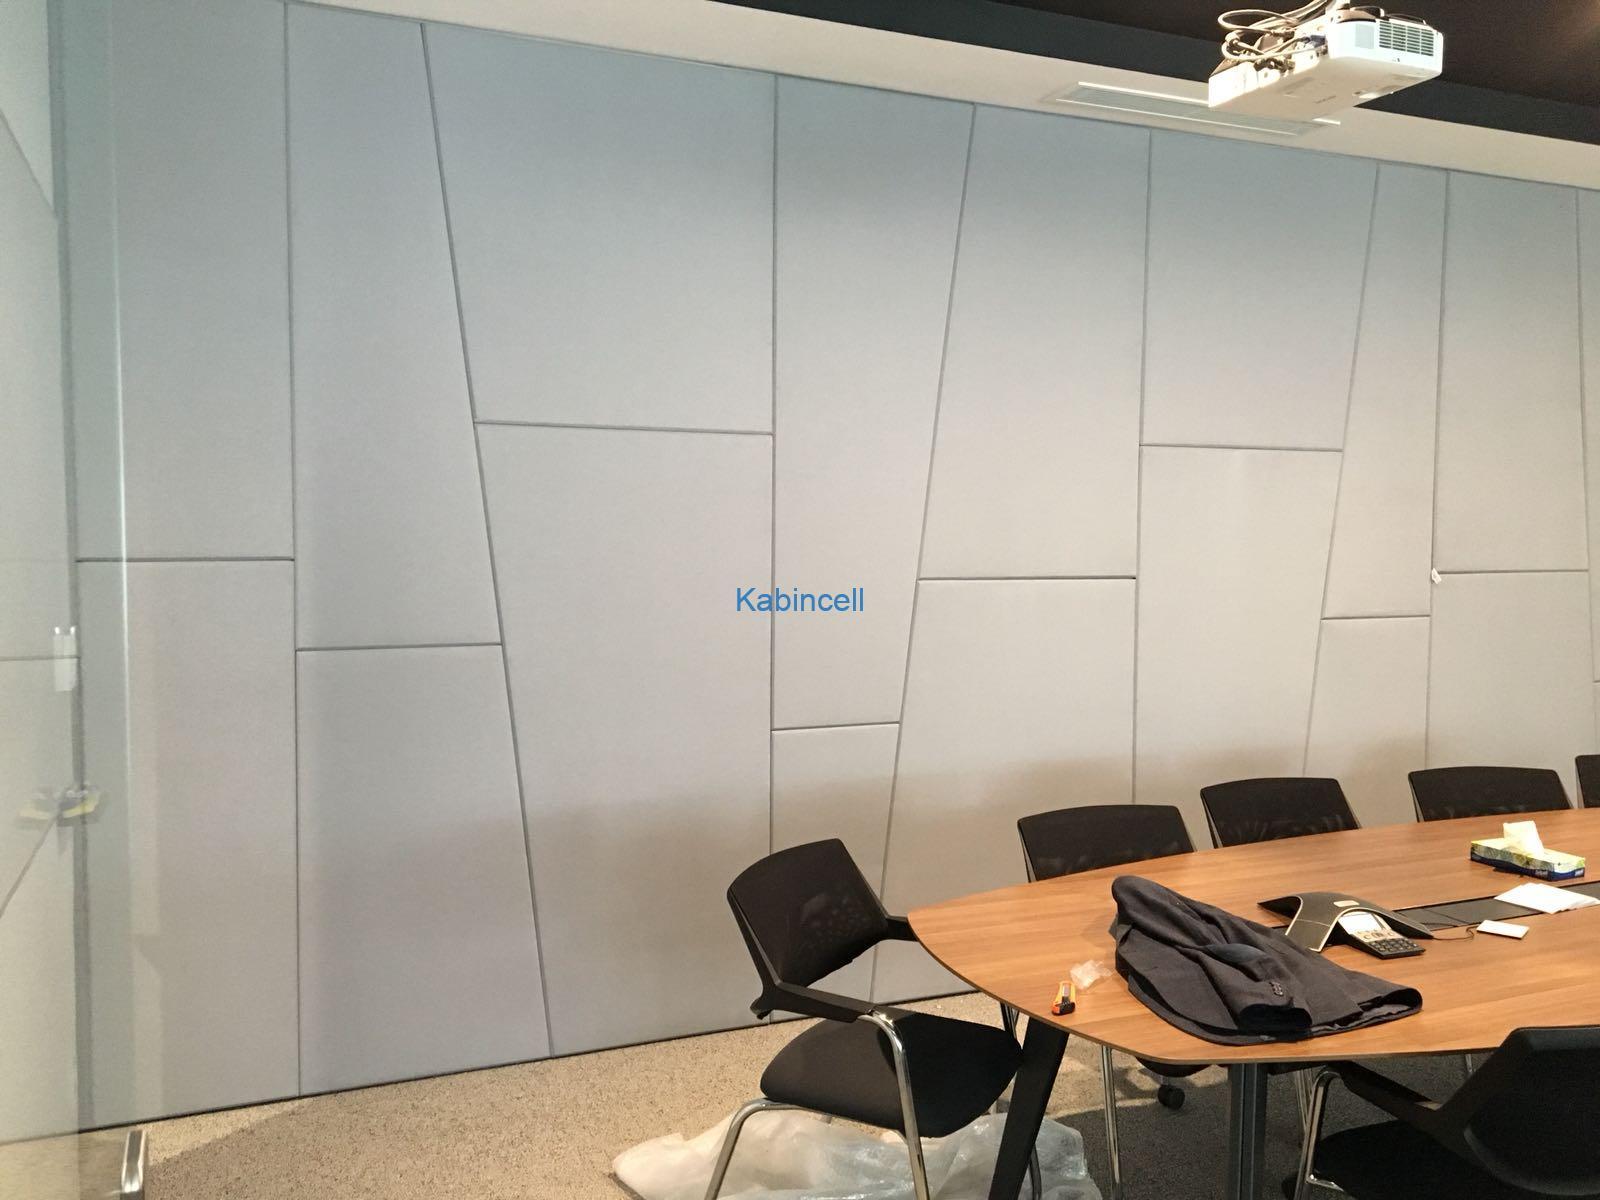 sestek-ofis-toplanti-odasi-ses-yalitimi-akustik-panel